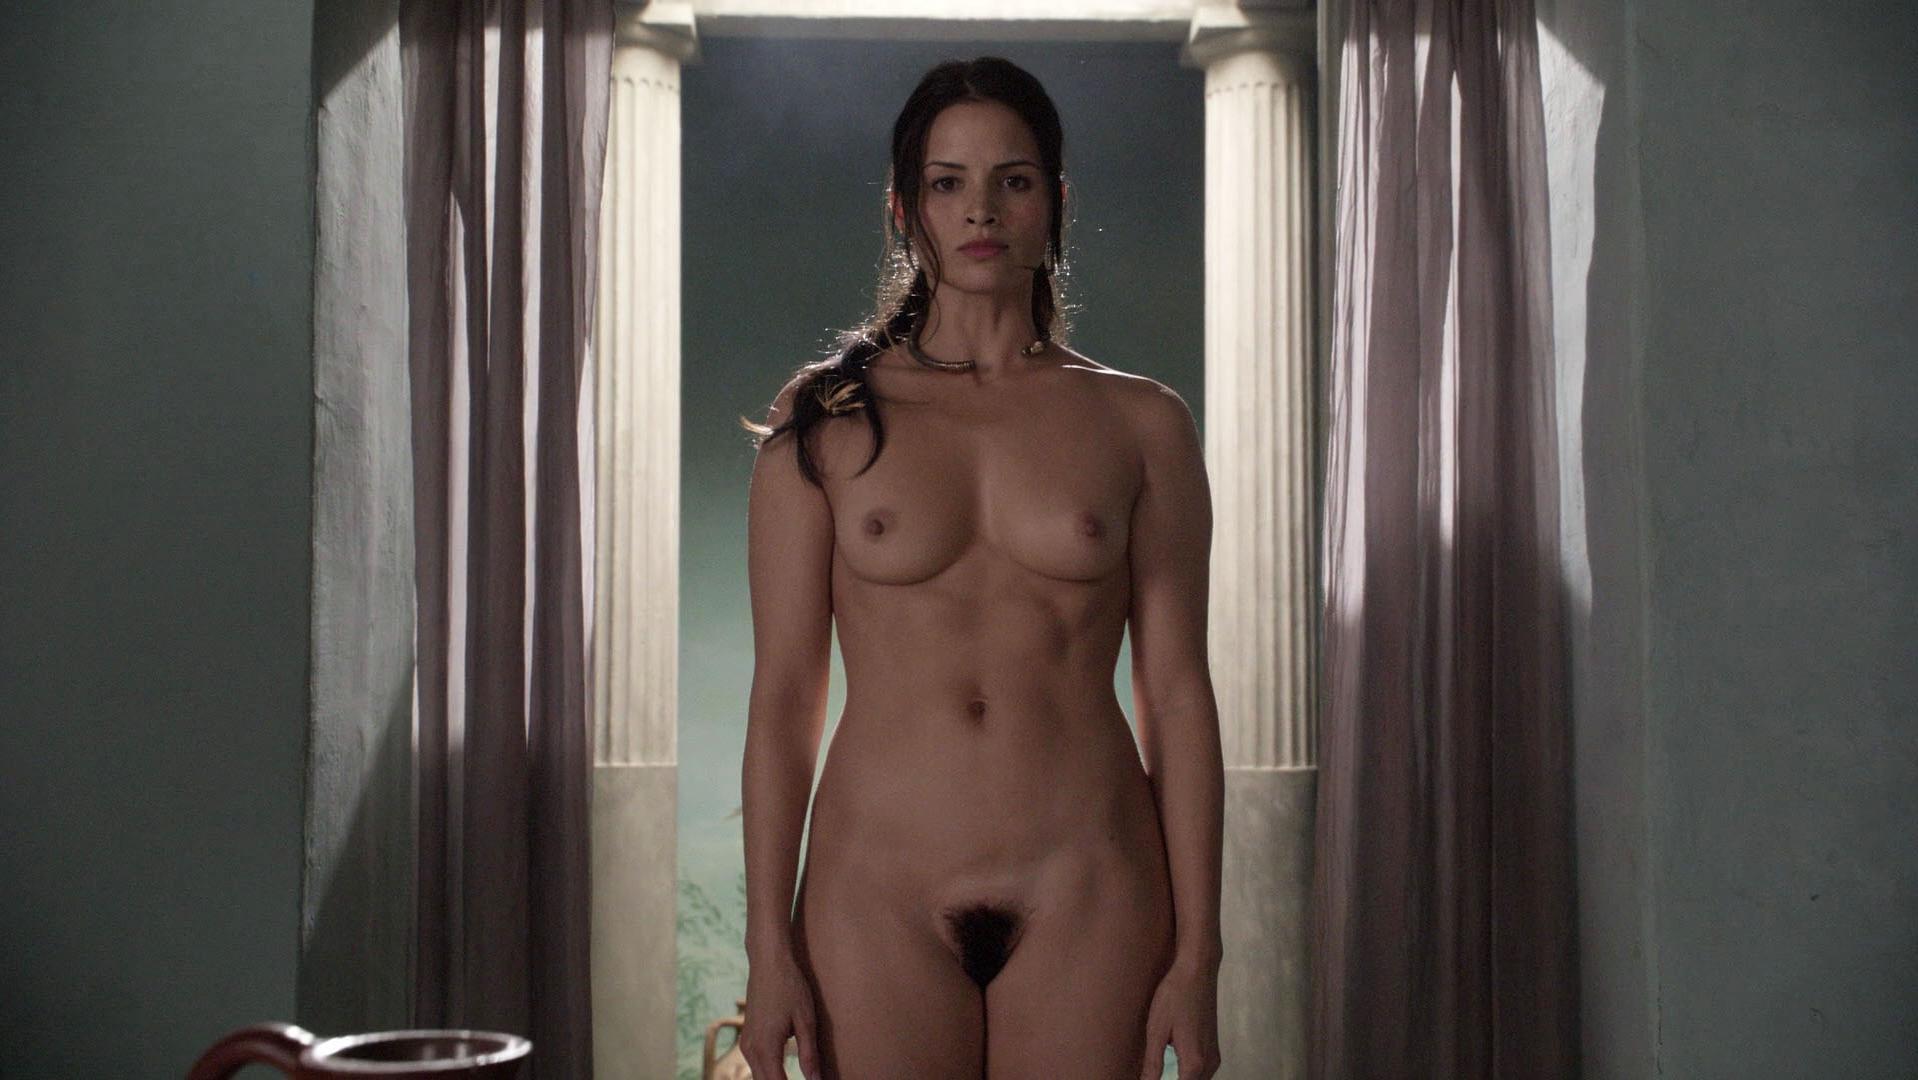 Big breast nude image-6512